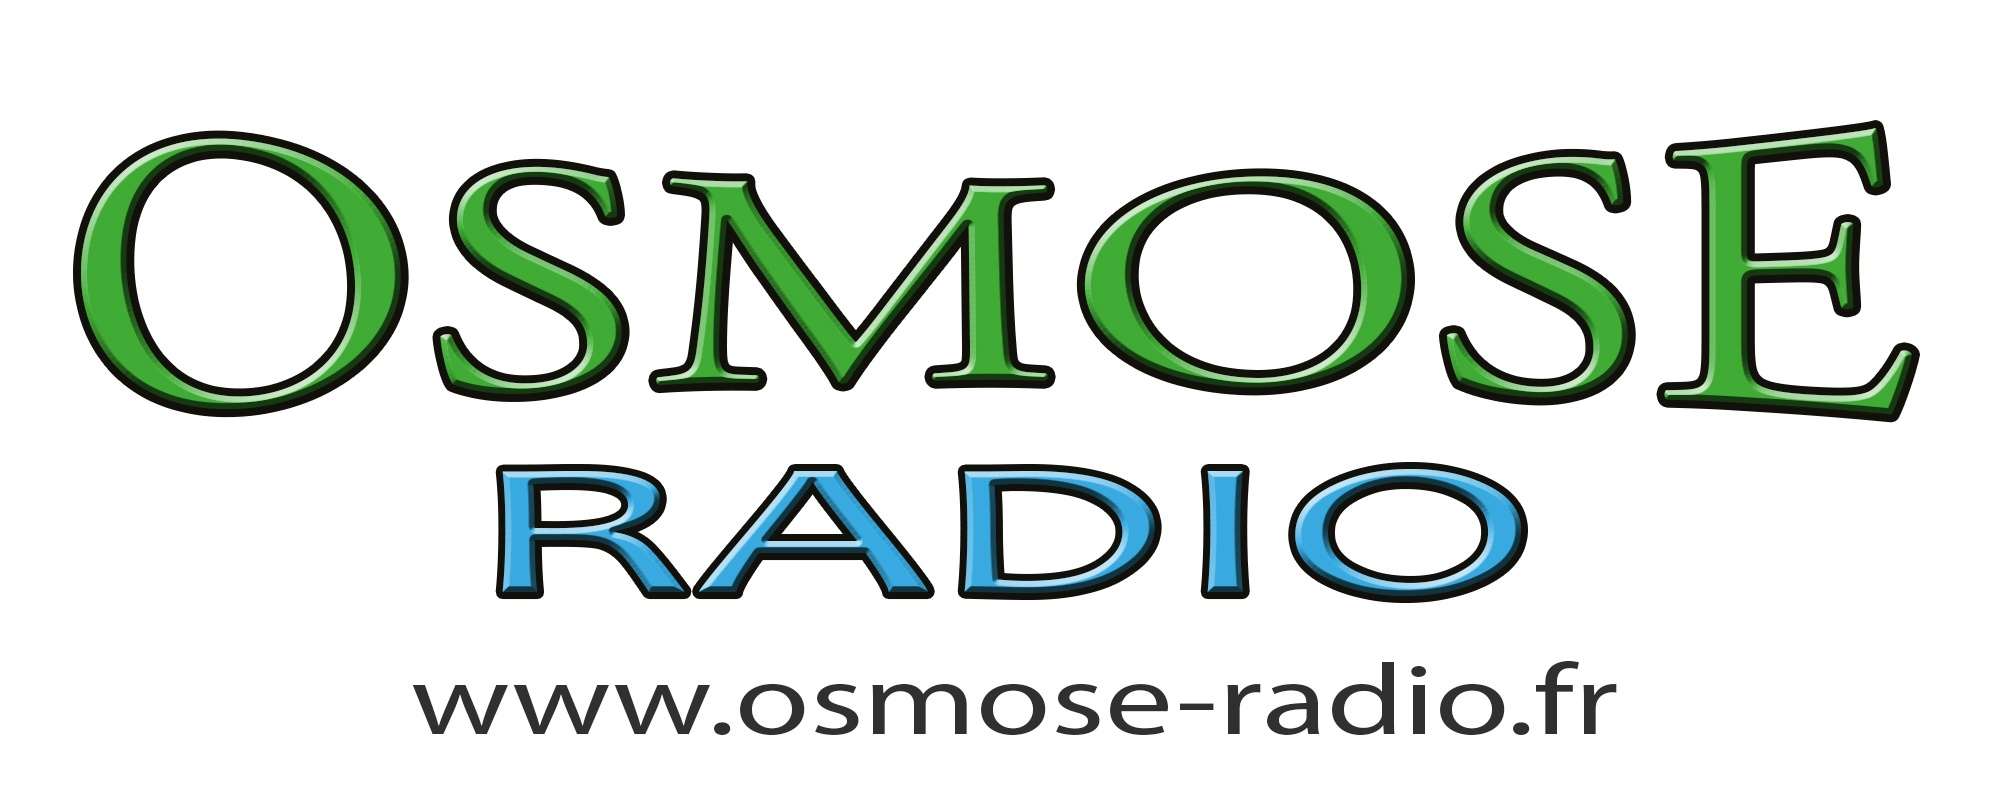 Osmose-Radio-Logo-avec-adresse-du-site-Fond-Blanc-2000x800